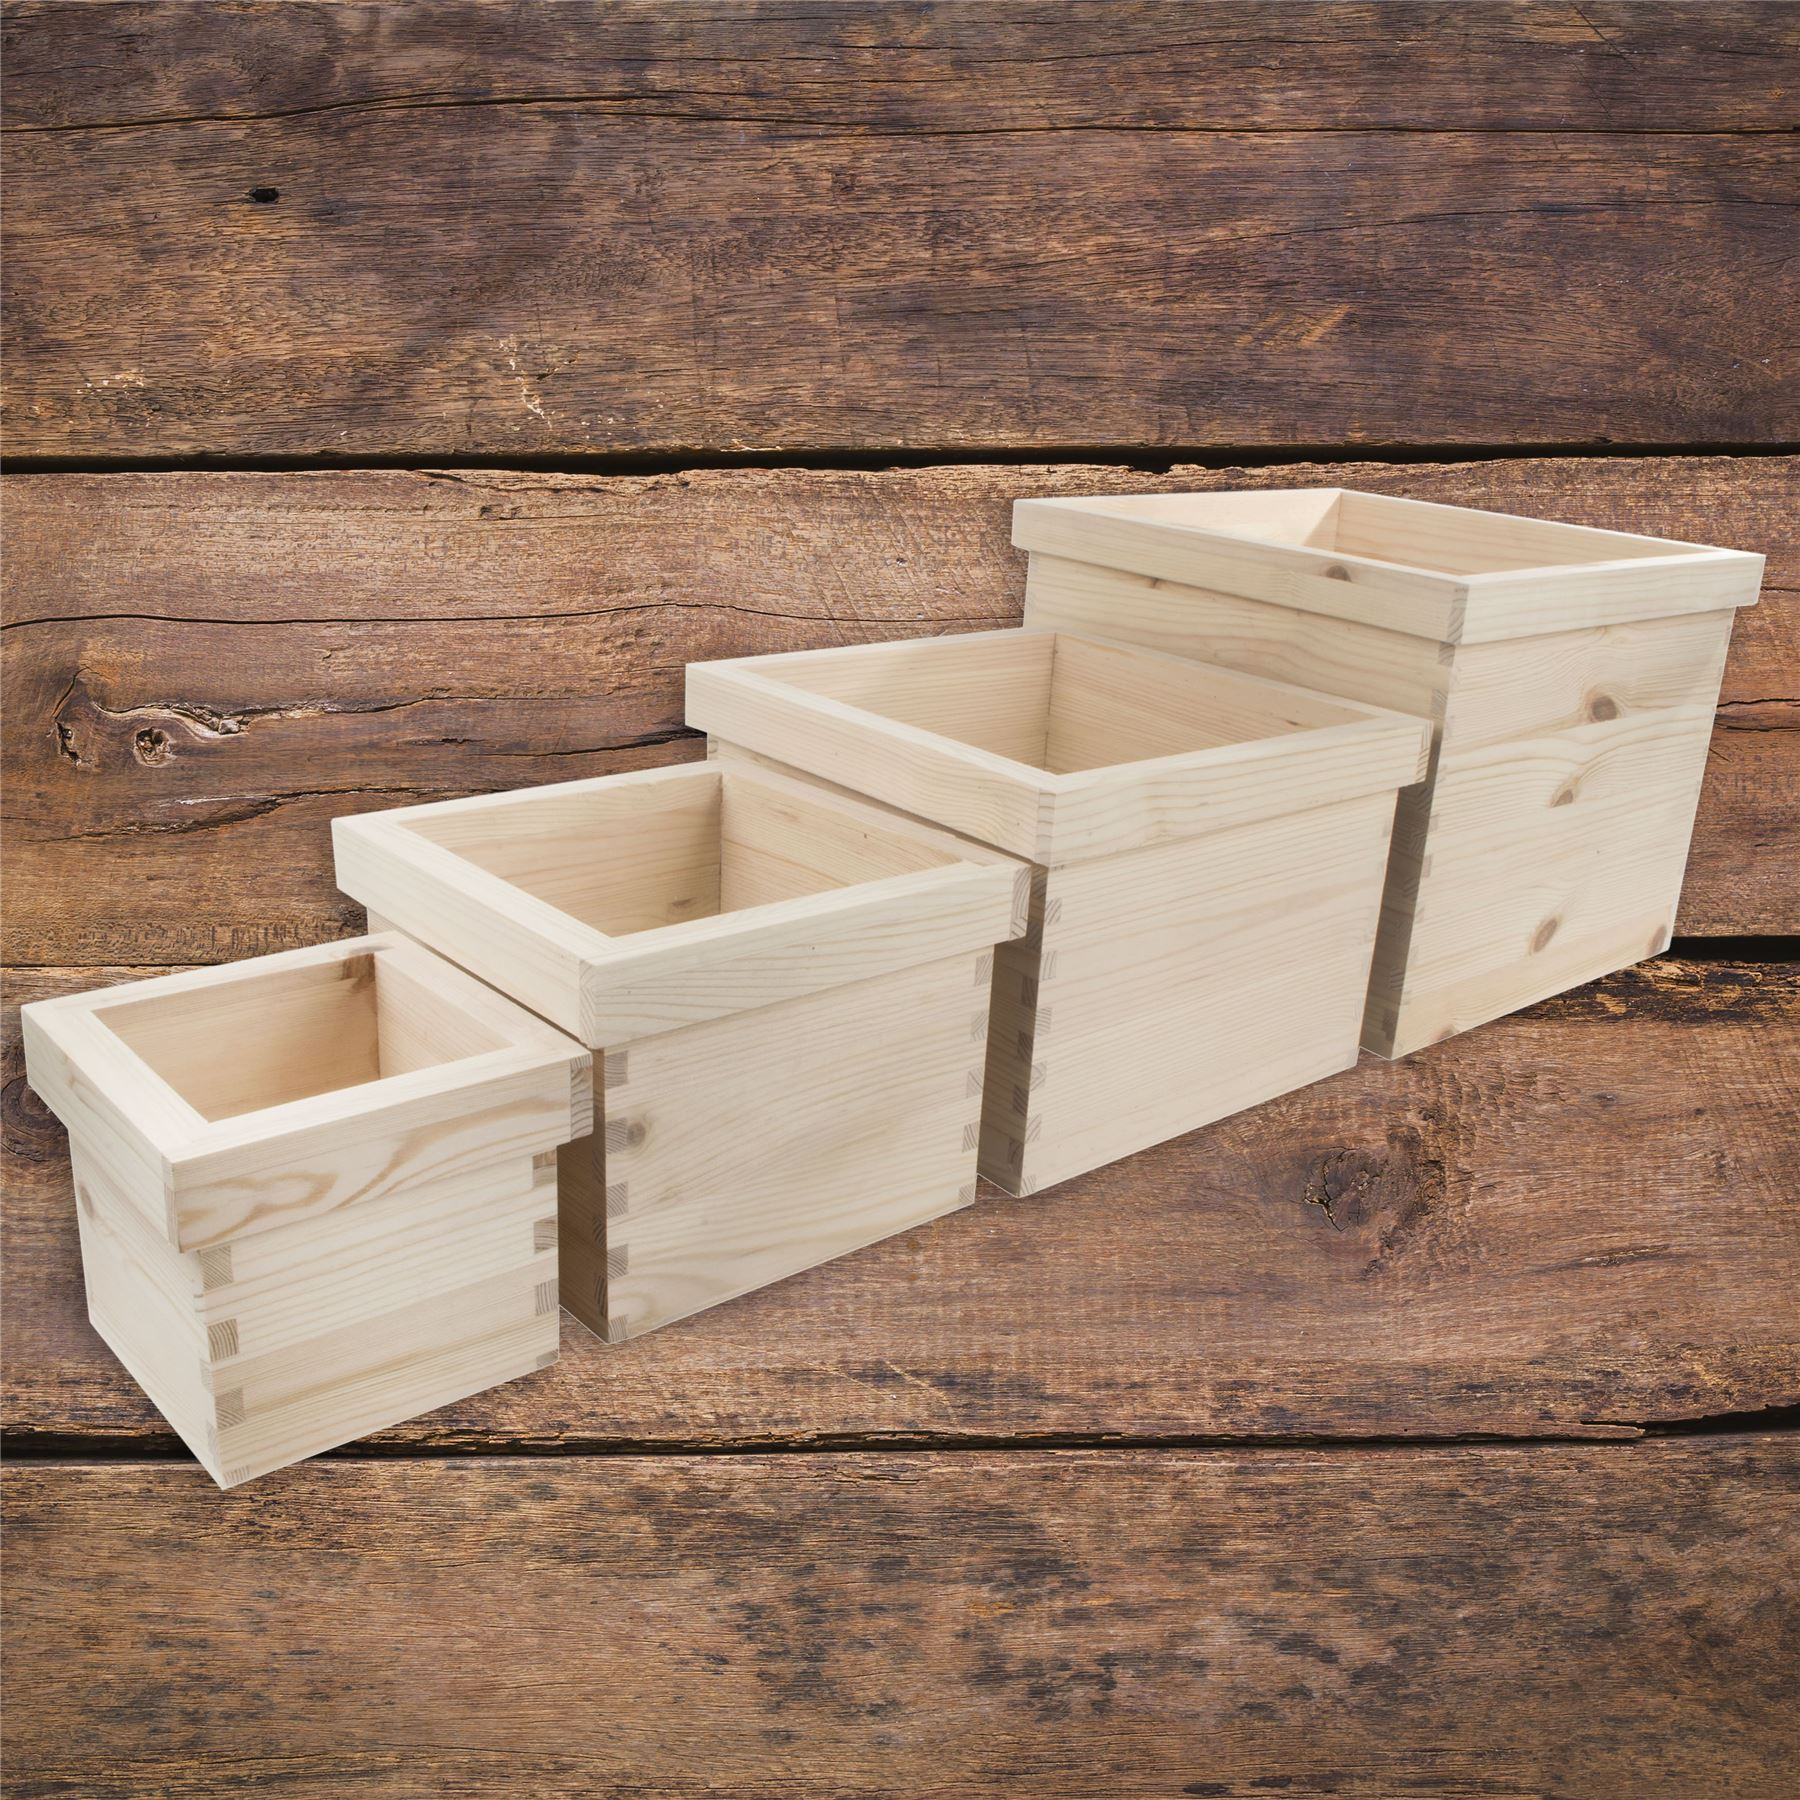 Kitchen Windowsill Herb Craft DIY Rectangular Plain Wooden Flower Pot Boxes